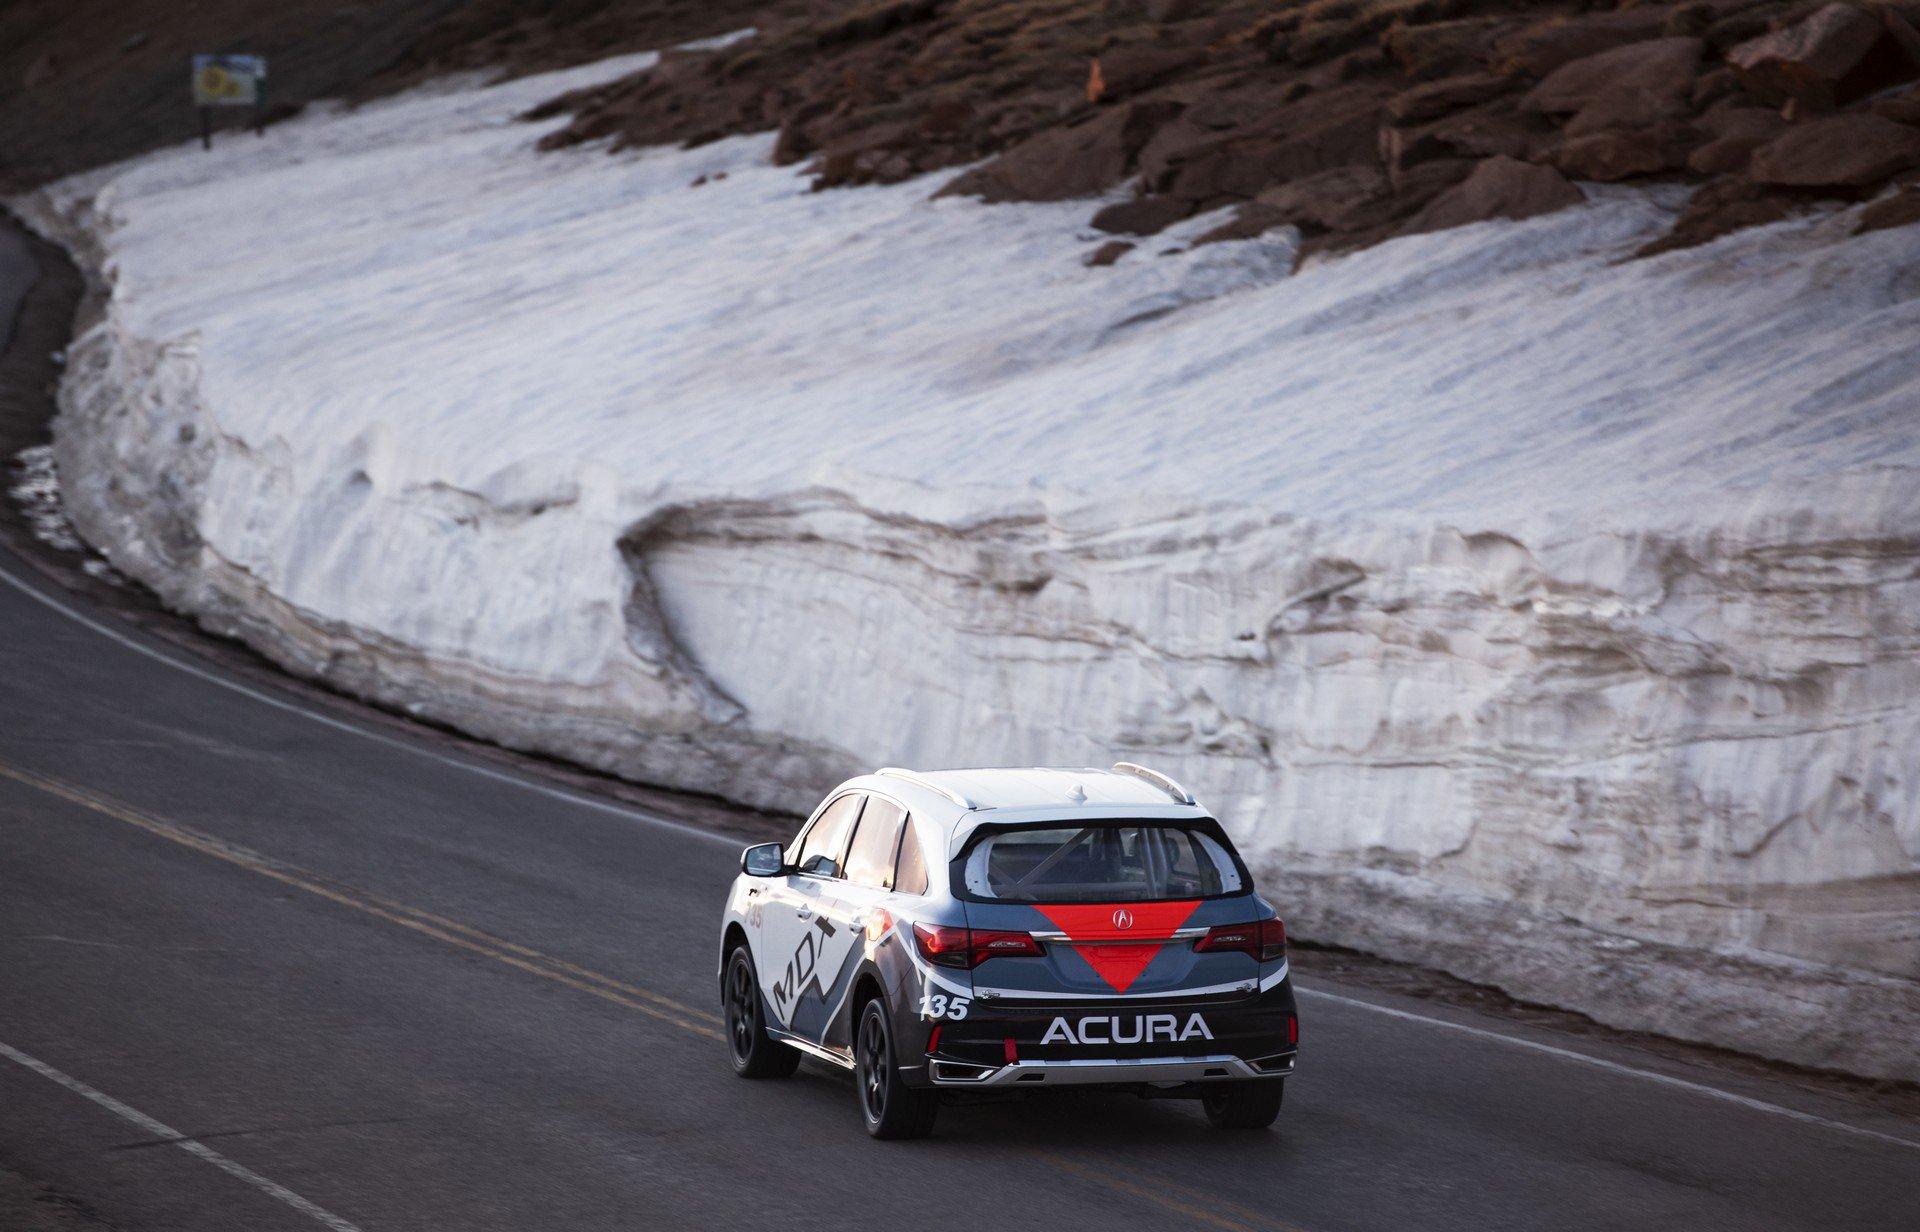 Acura-at-Pikes-Peak-International-Hill-Climb-2019-24